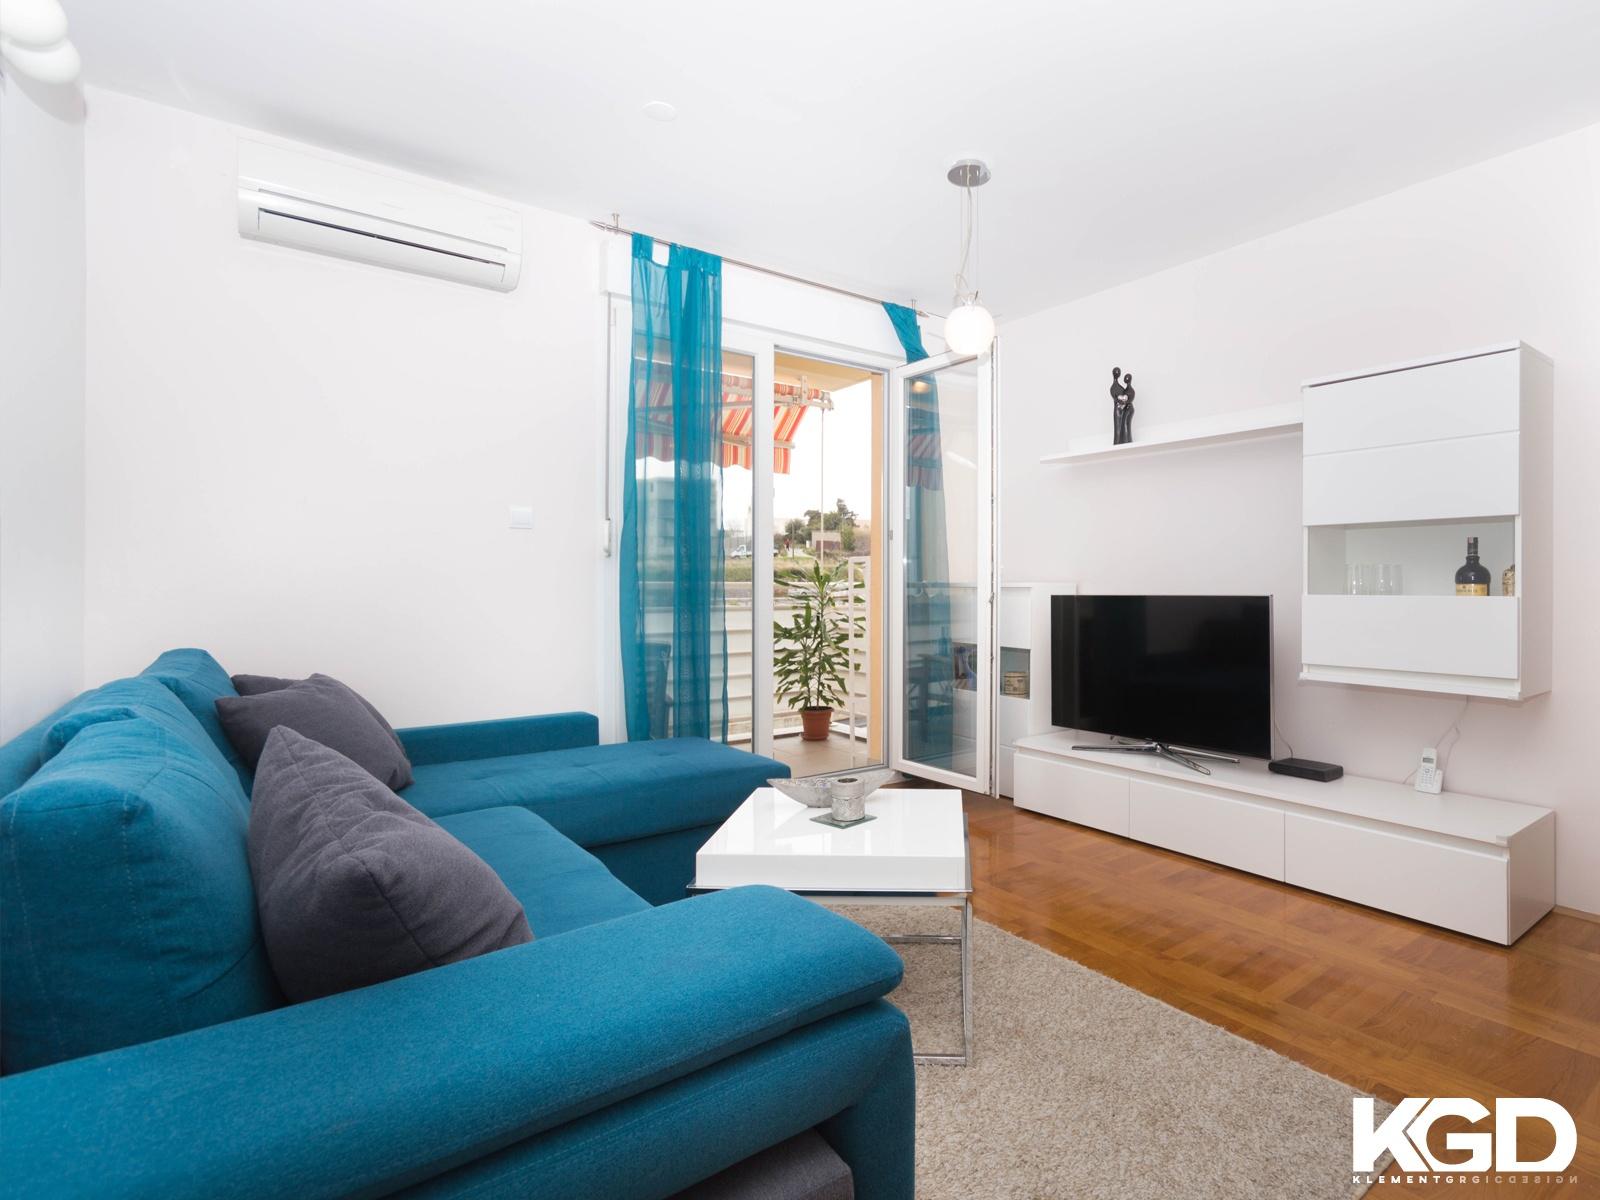 Apartment shooting - Klement Grgić